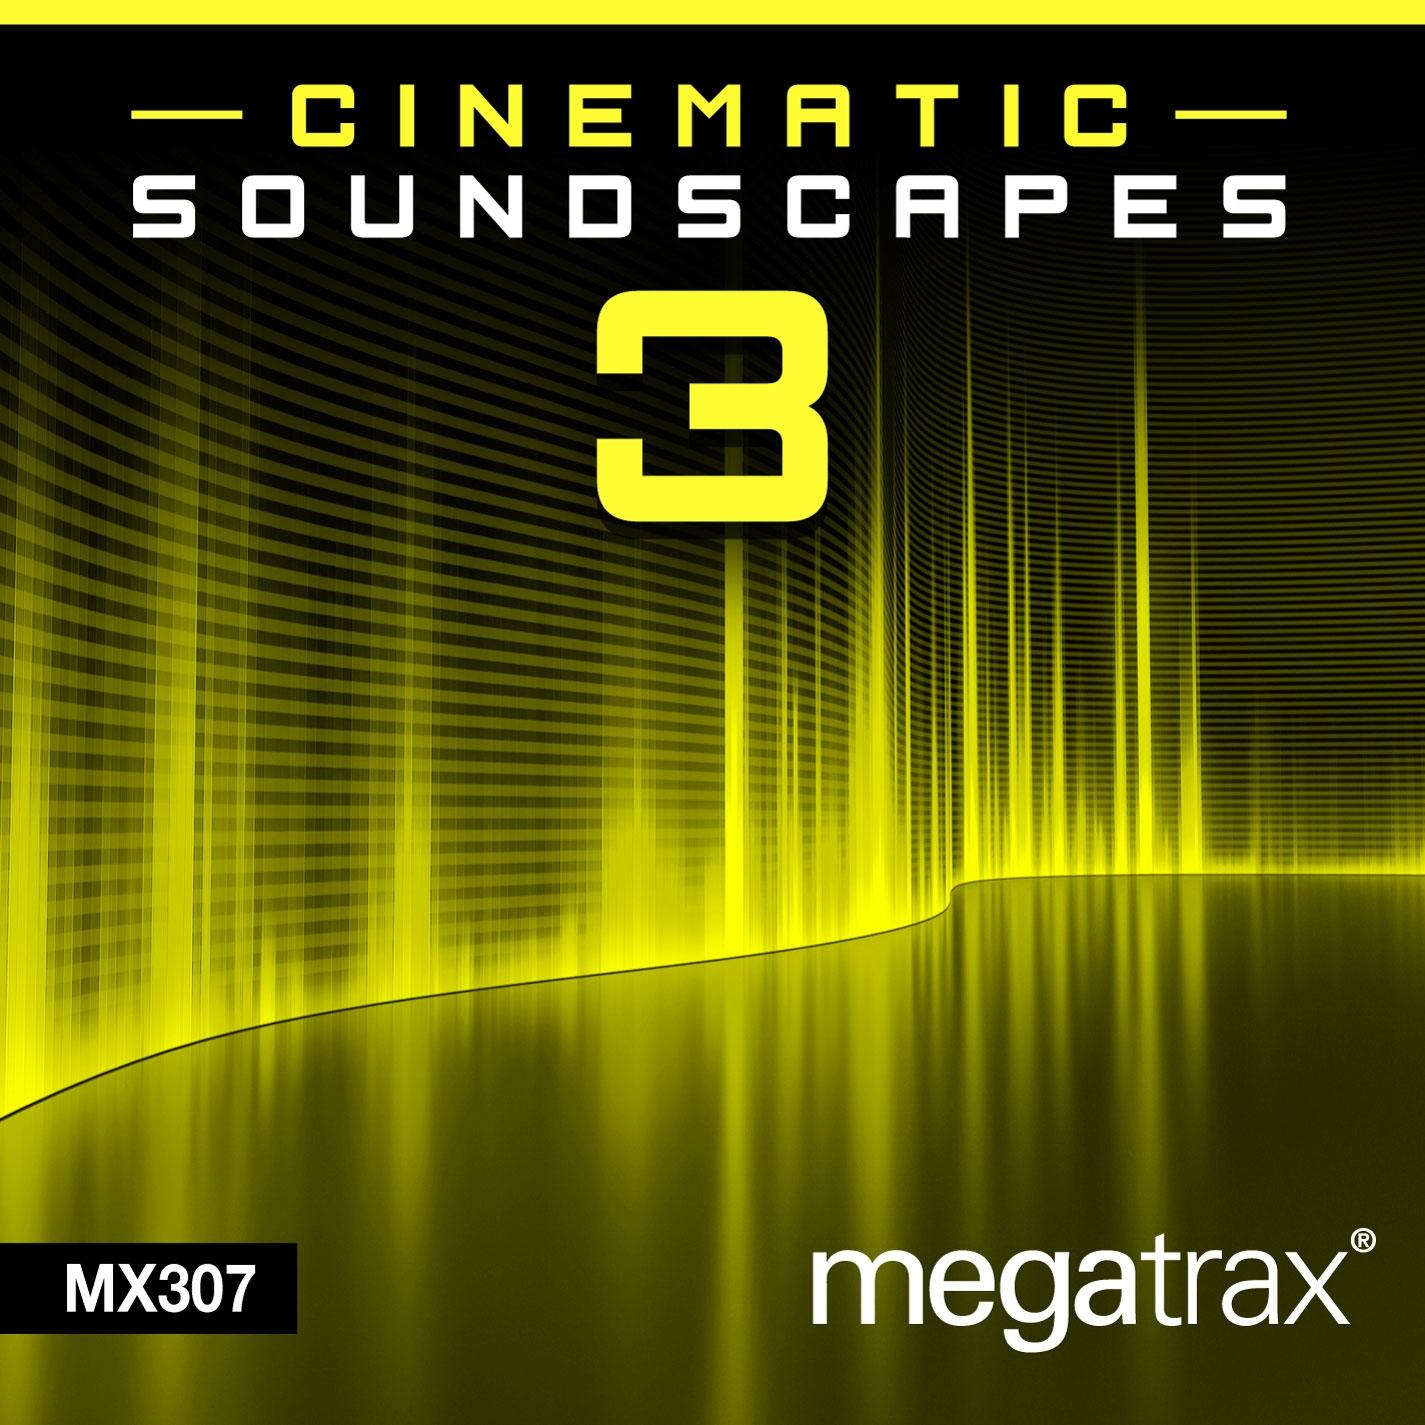 Cinematic Soundscapes 3